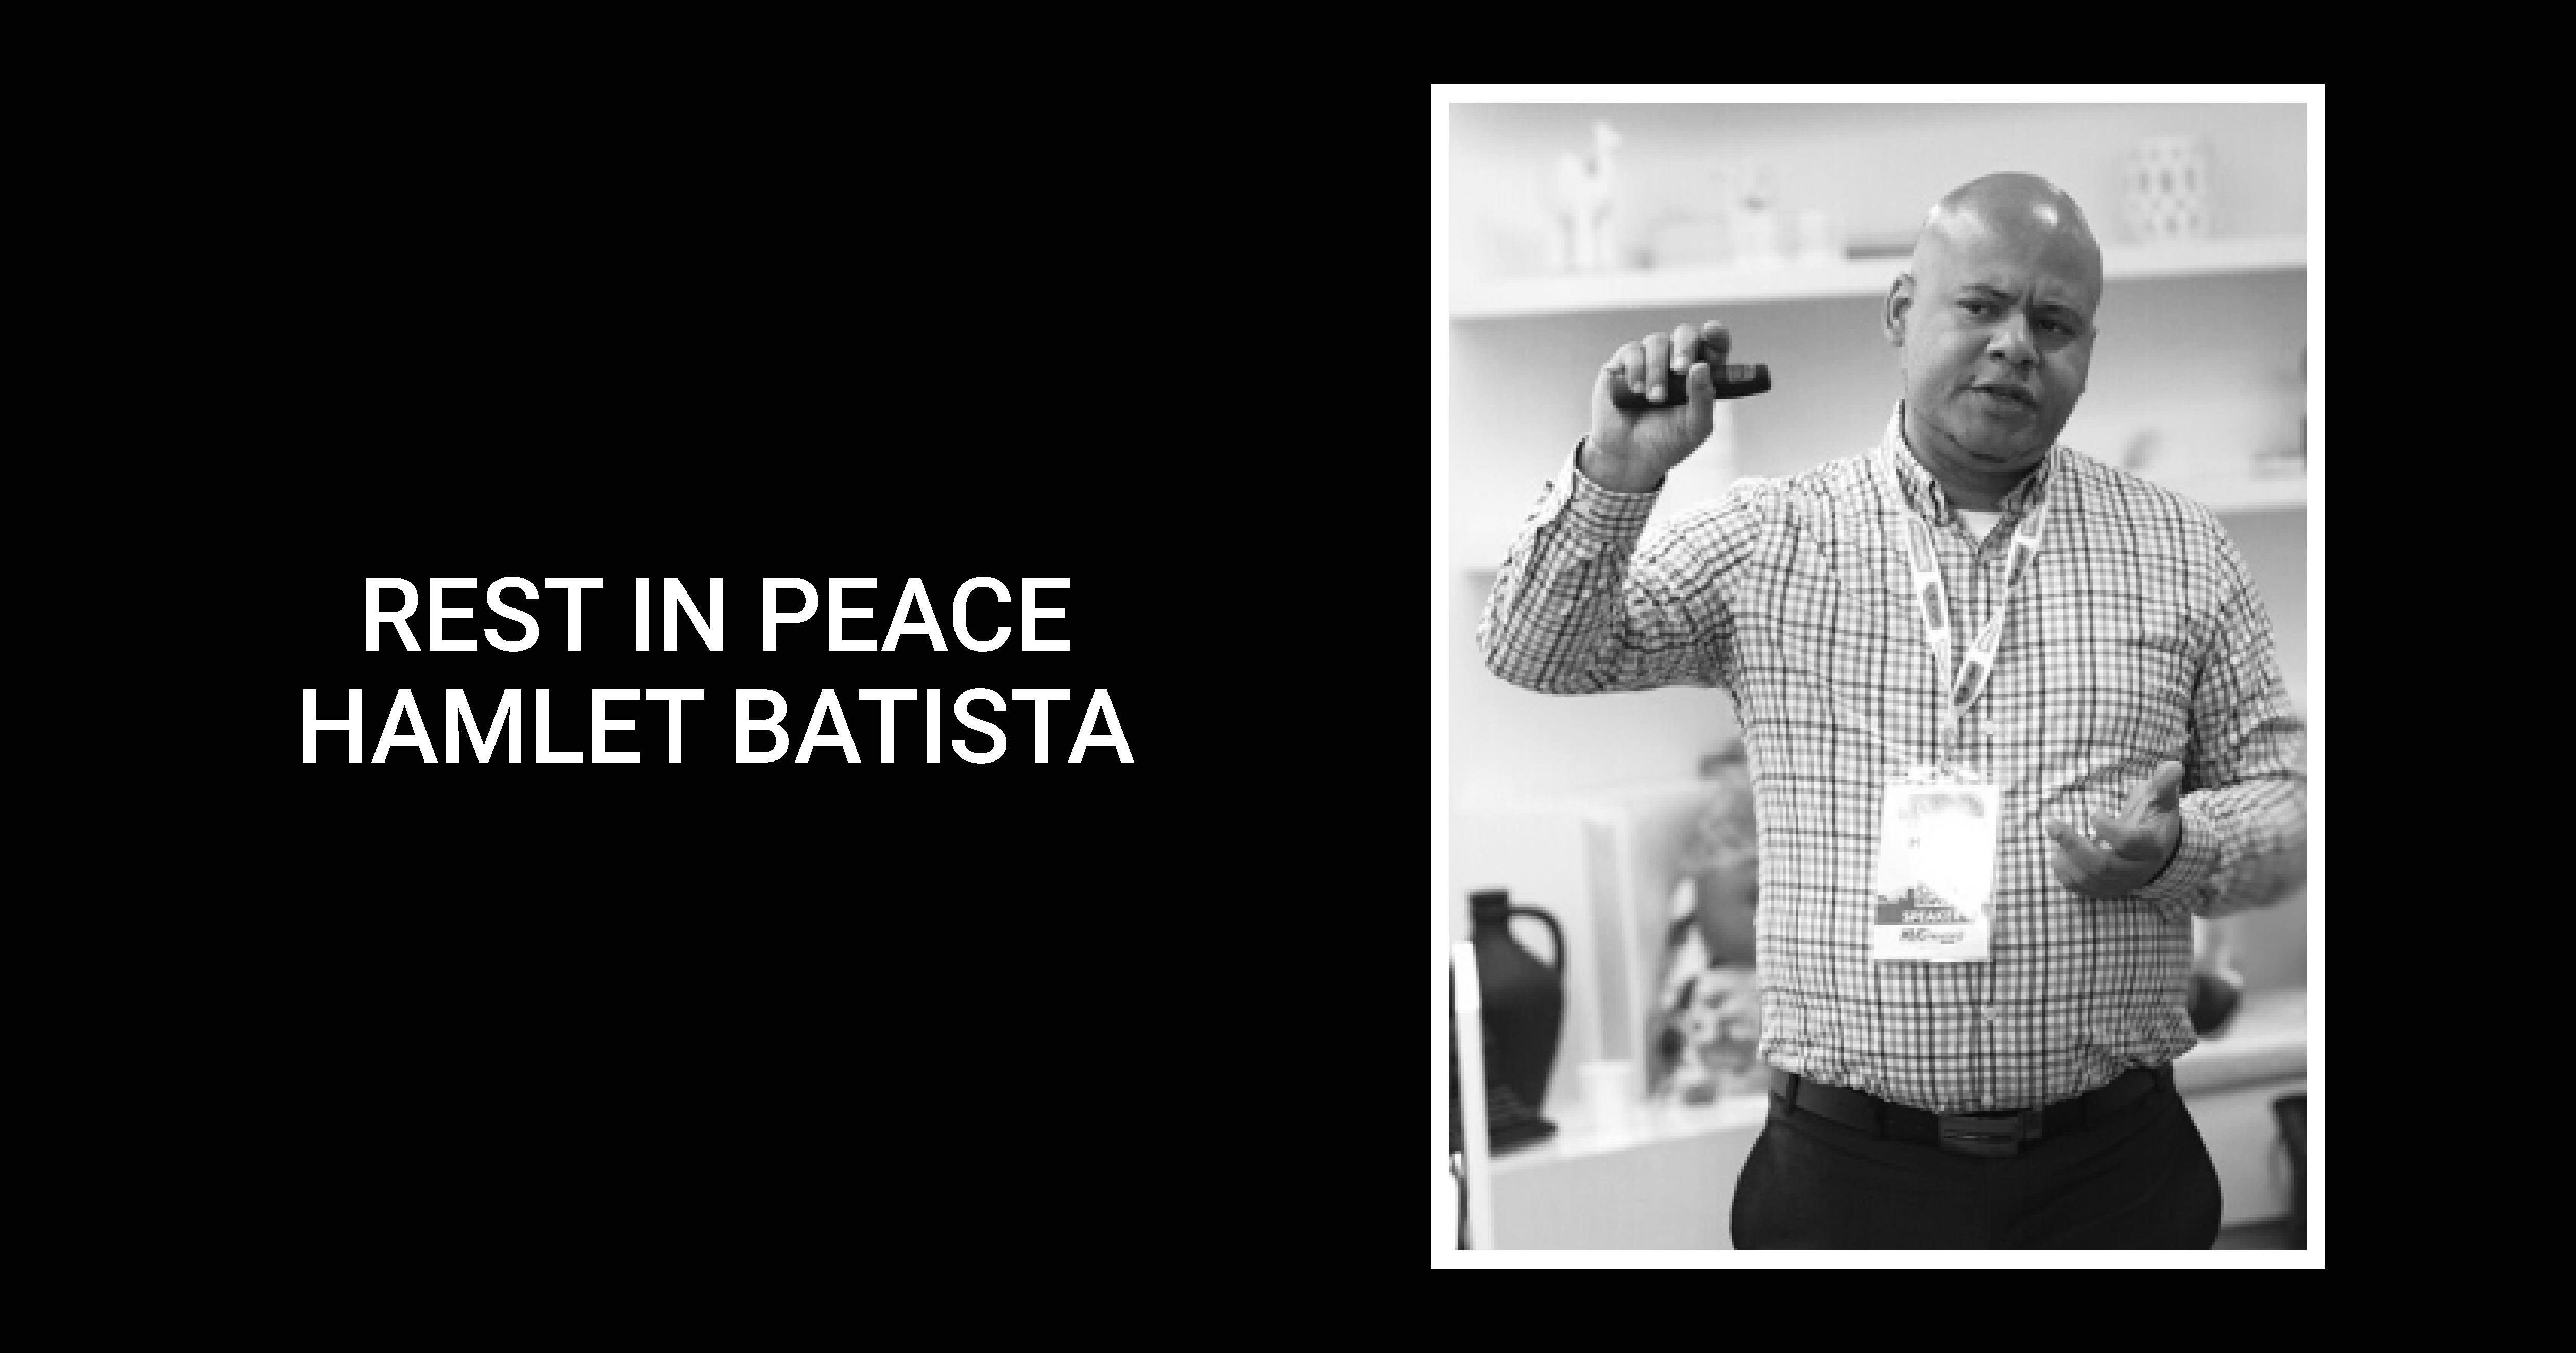 In Memory of Hamlet Batista